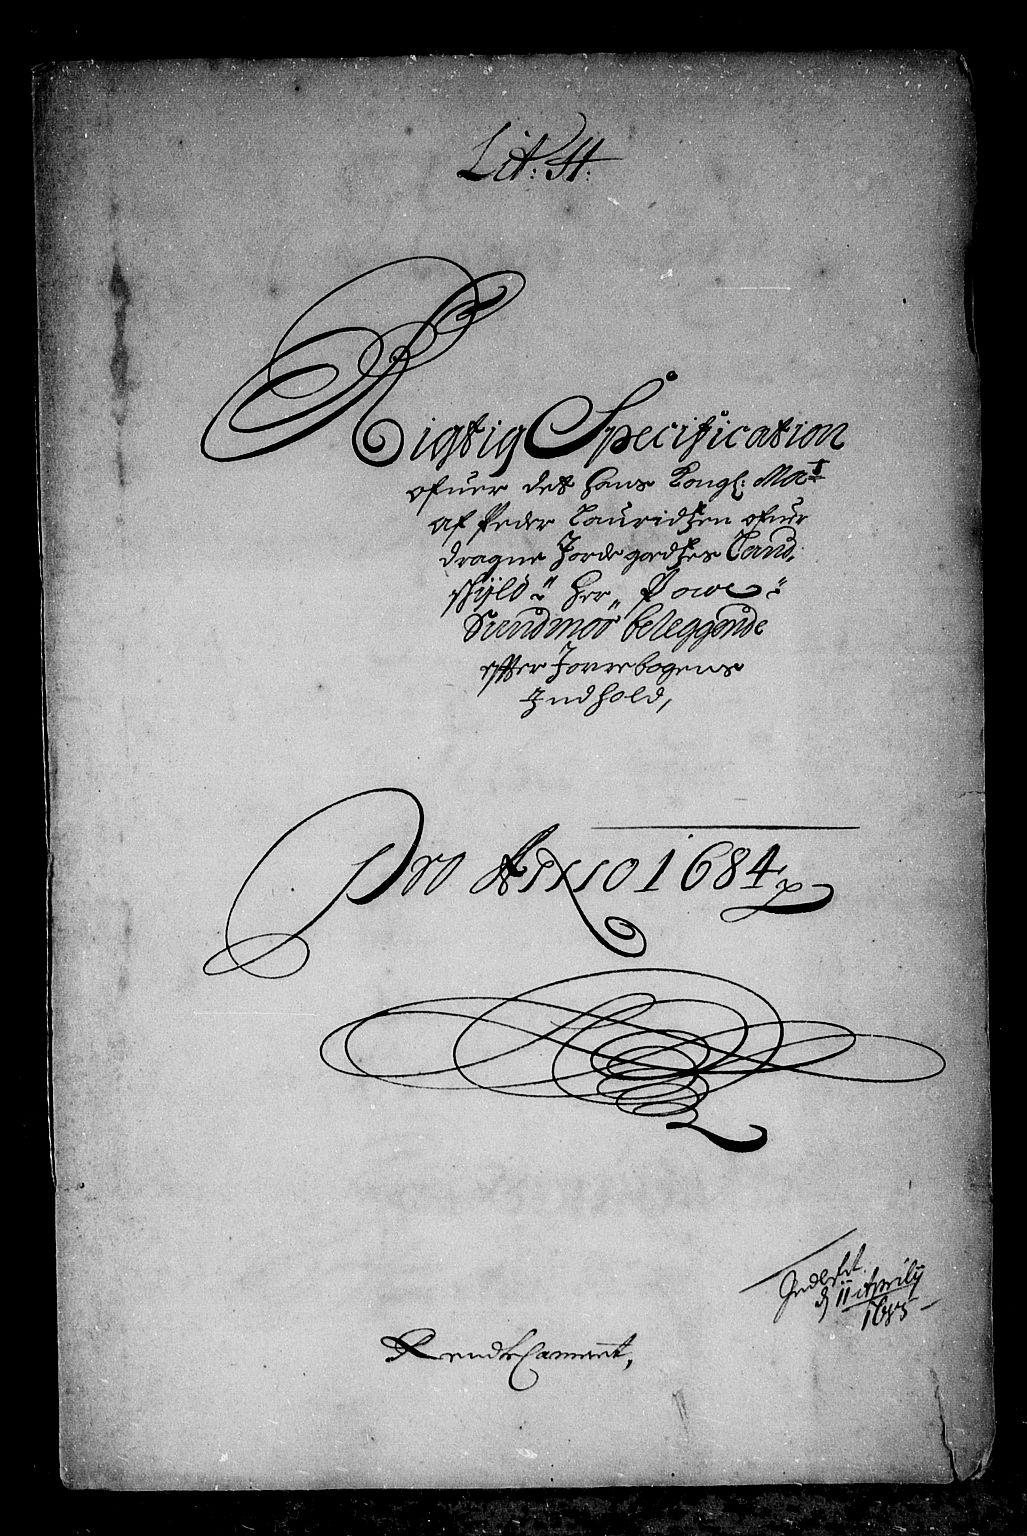 RA, Rentekammeret inntil 1814, Reviderte regnskaper, Stiftamtstueregnskaper, Bergen stiftamt, R/Rc/L0074: Bergen stiftamt, 1684